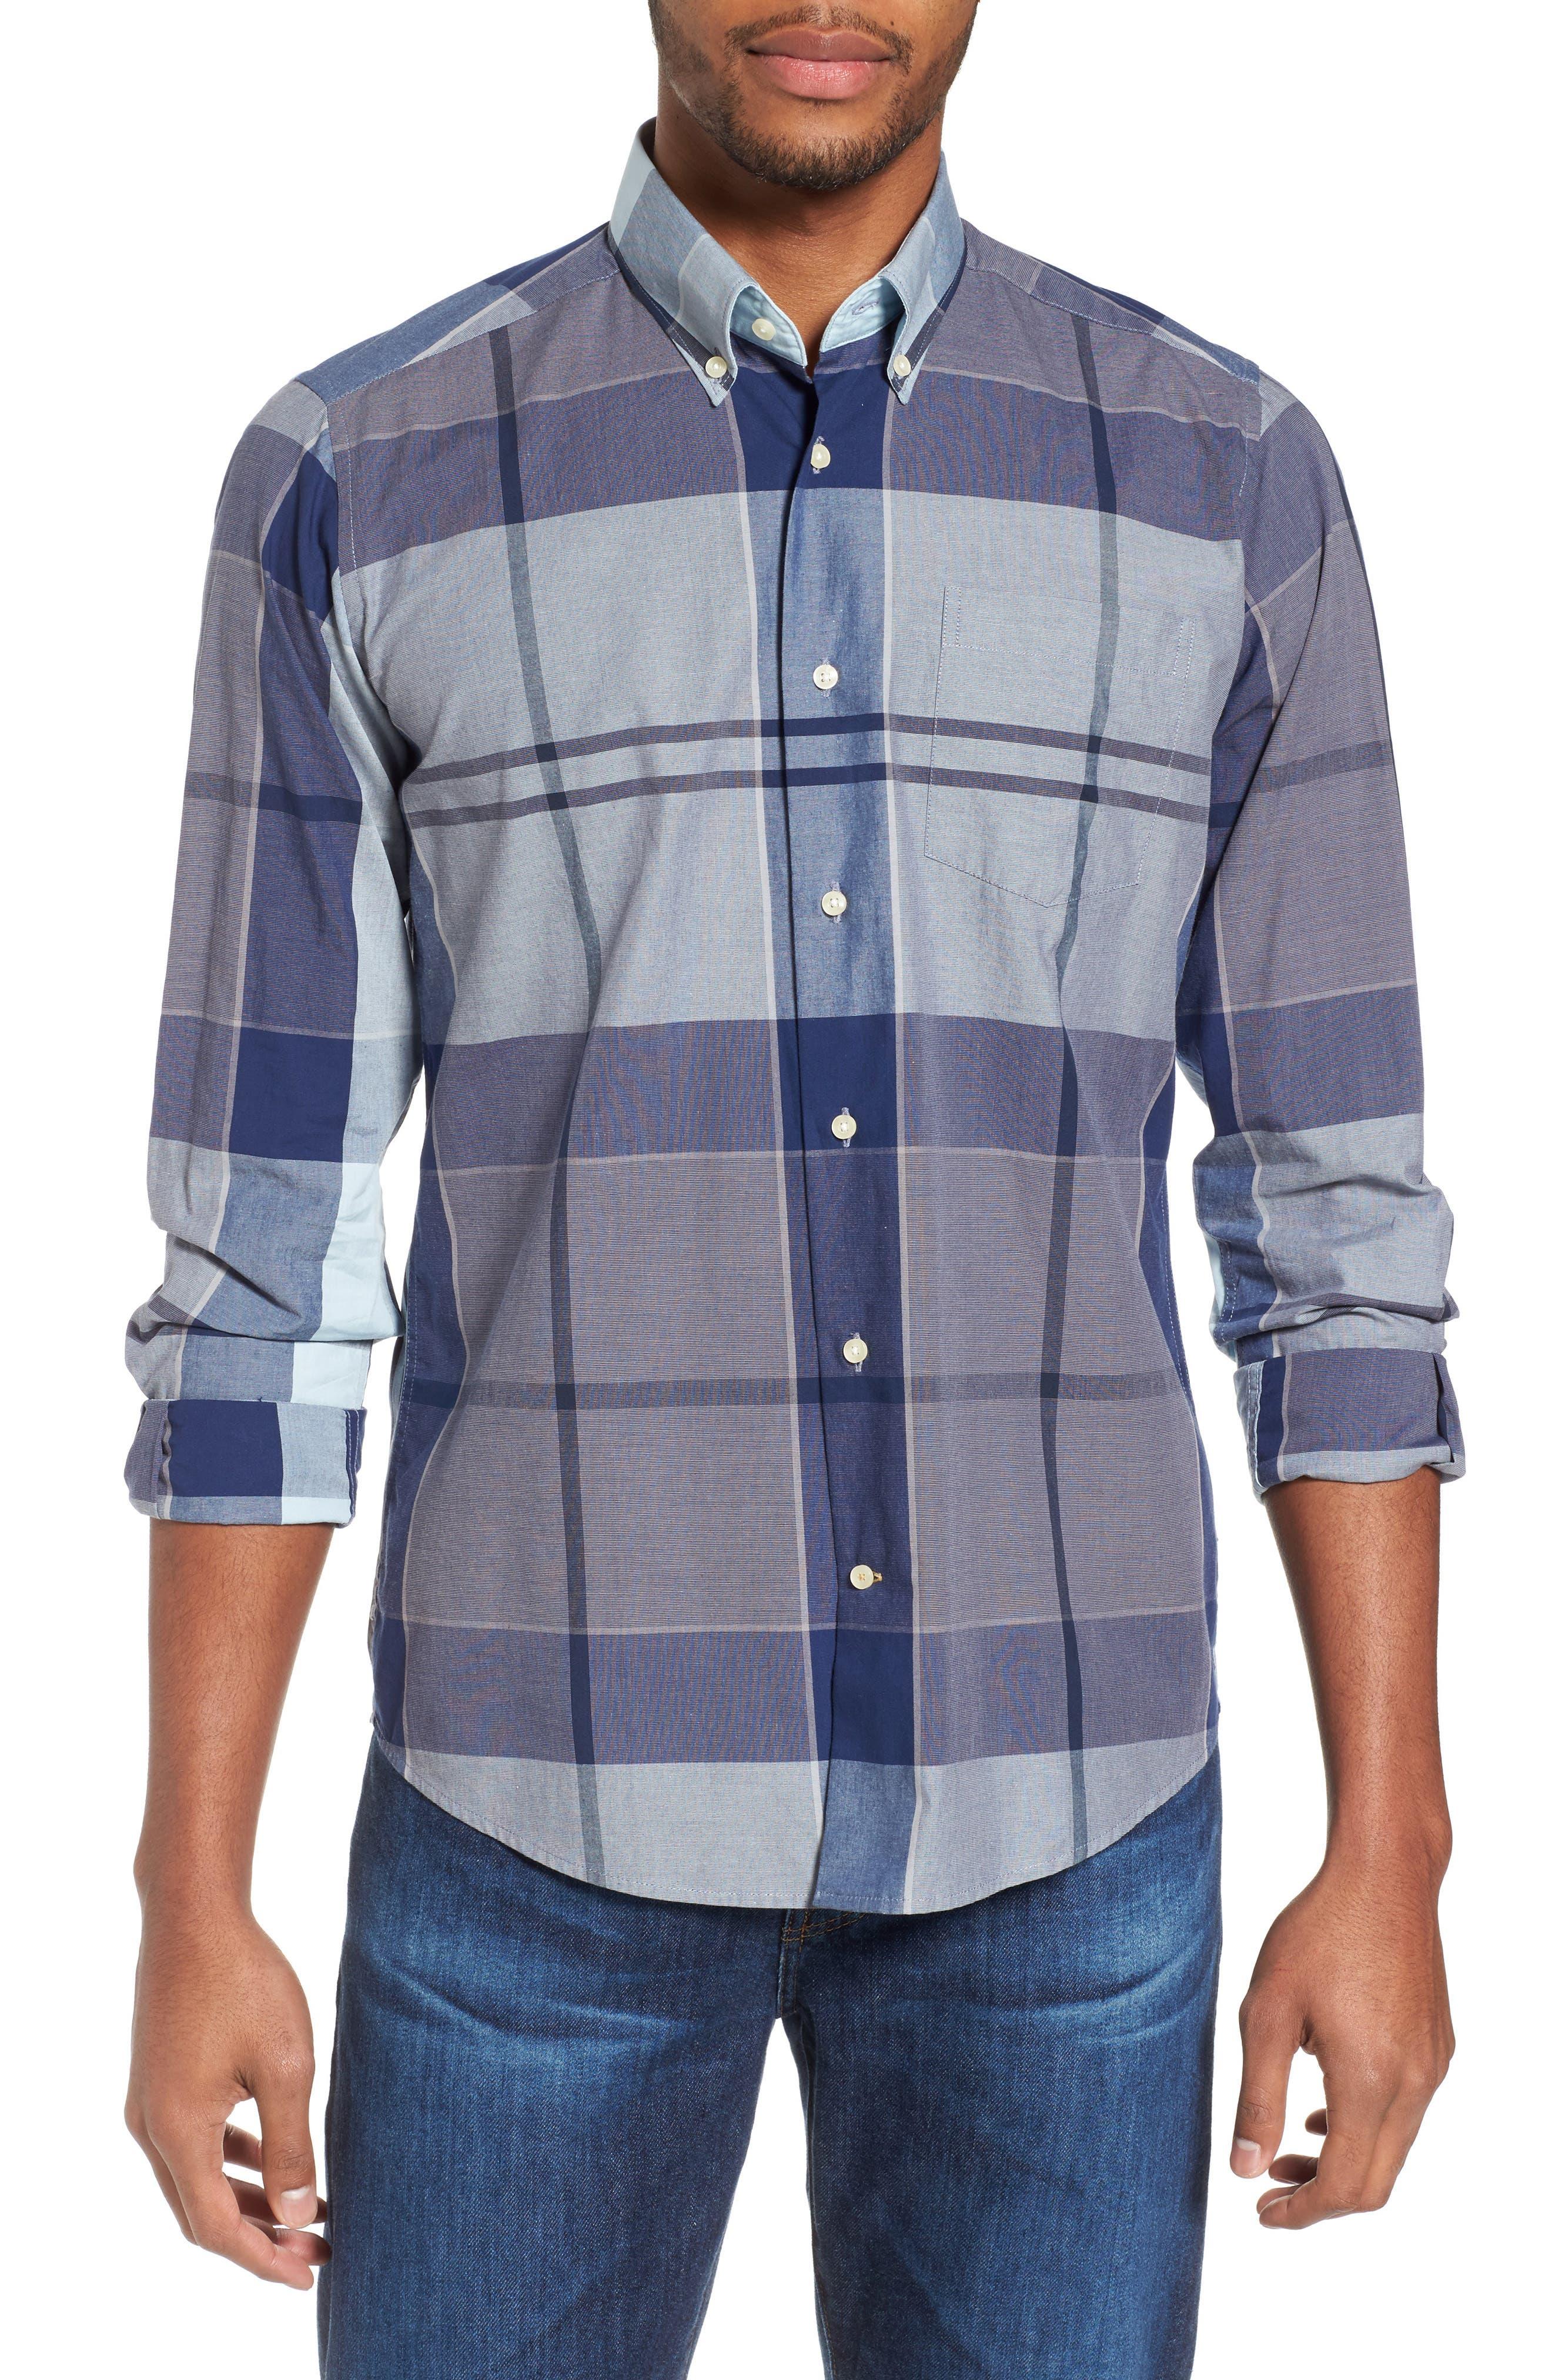 Arndale Tailored Fit Plaid Sport Shirt,                             Main thumbnail 1, color,                             450